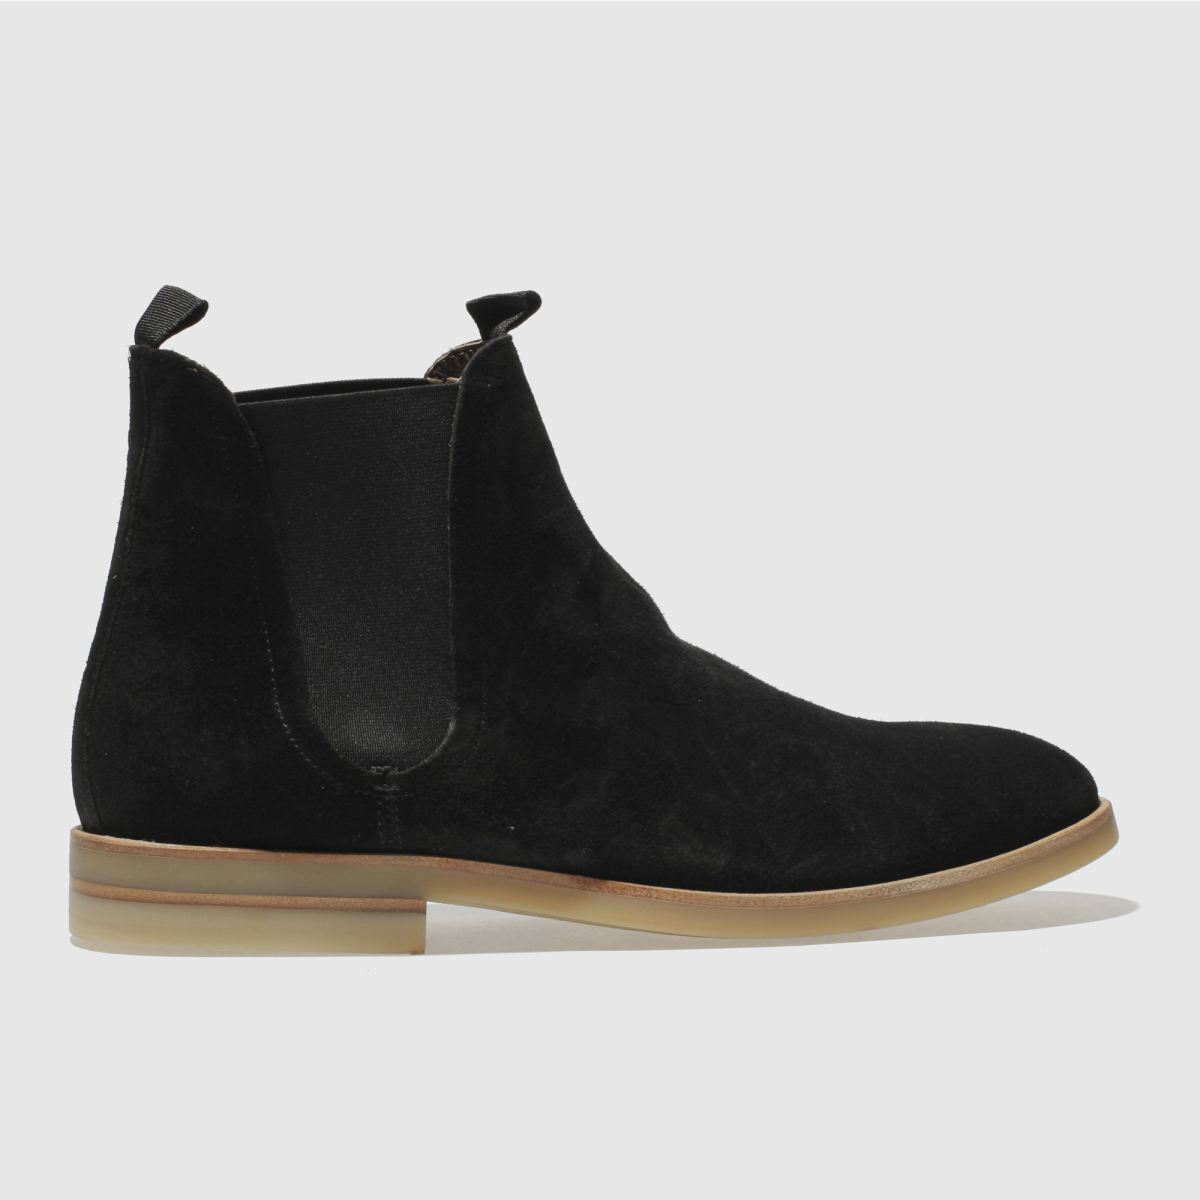 H By Hudson Black Adlington Boots